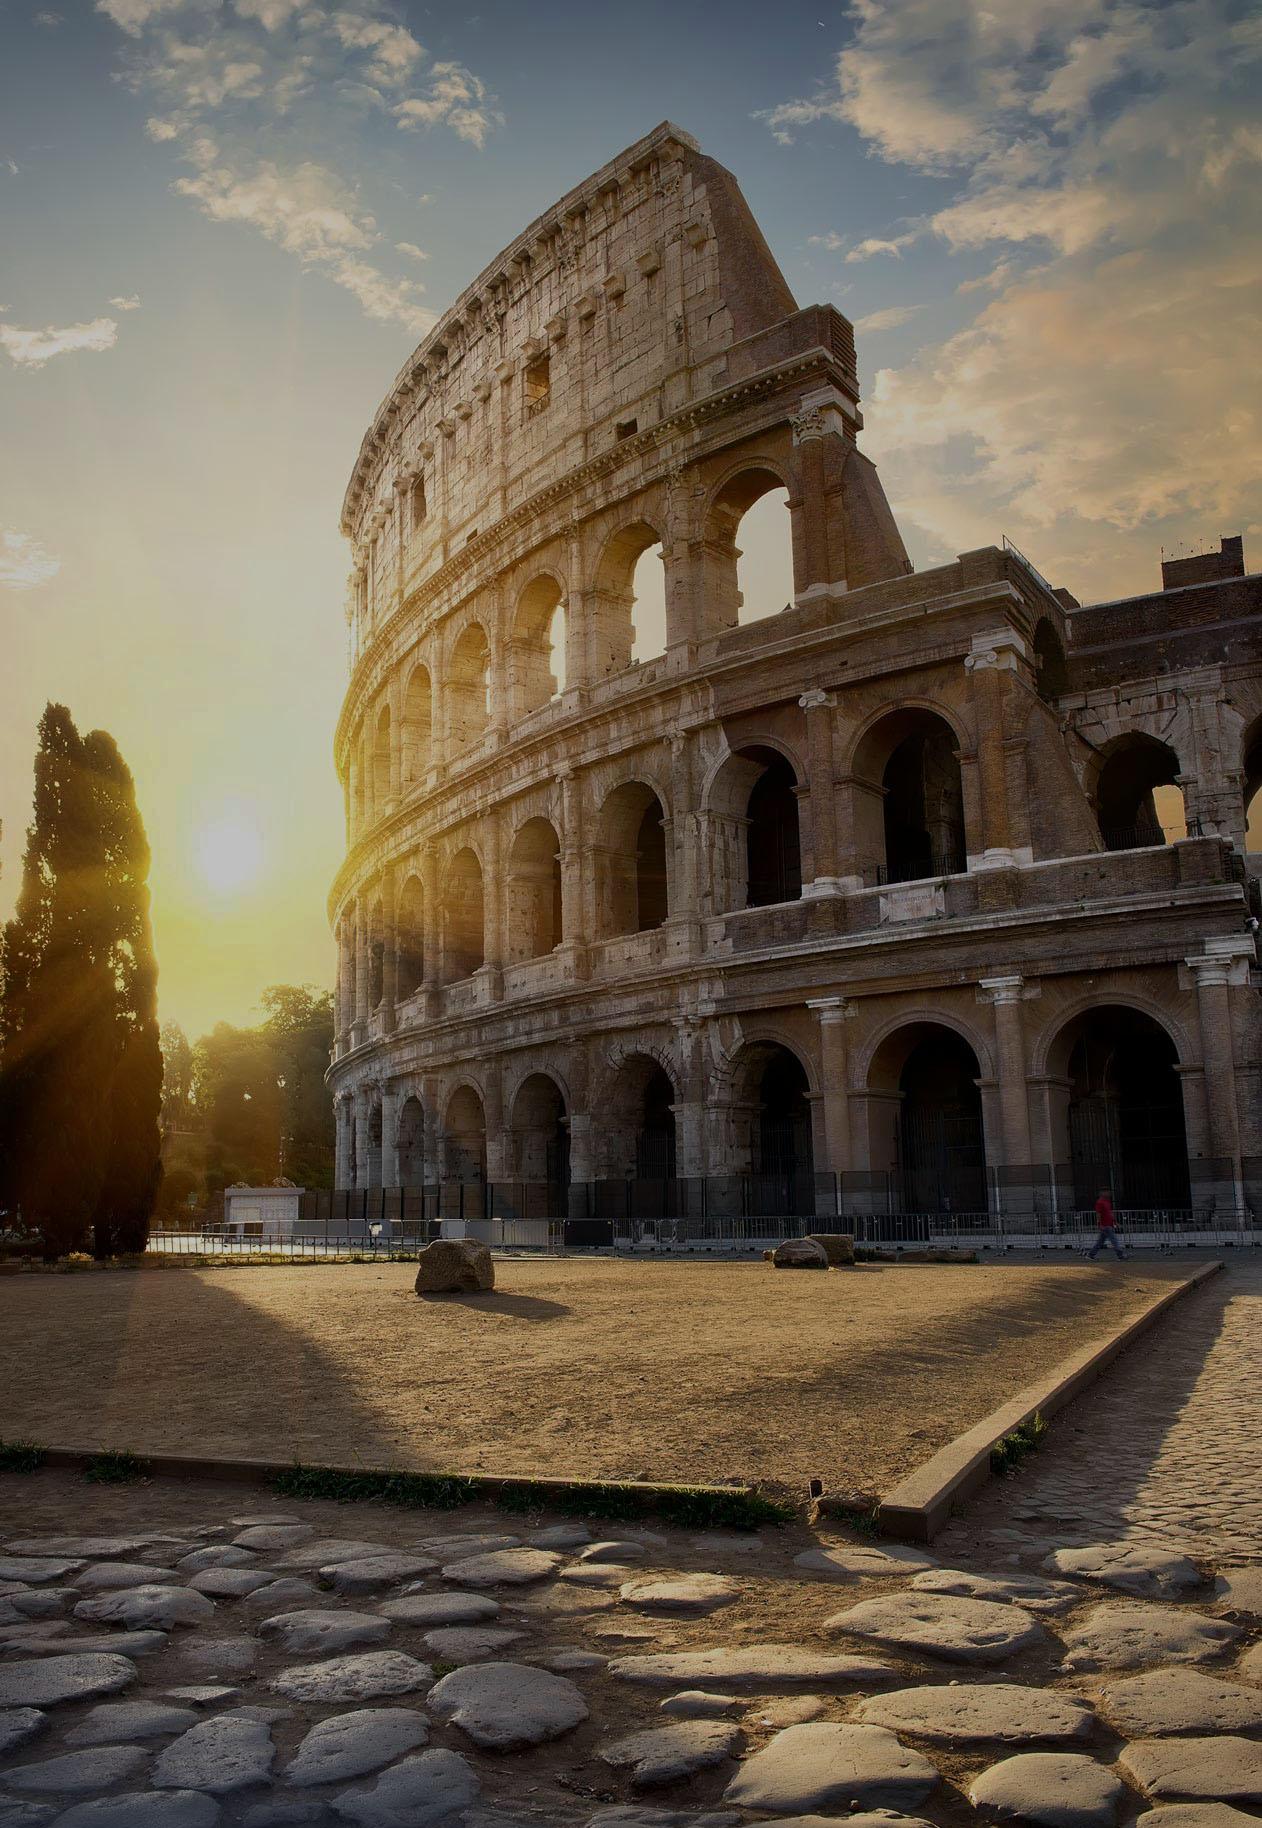 bespoke tours italy